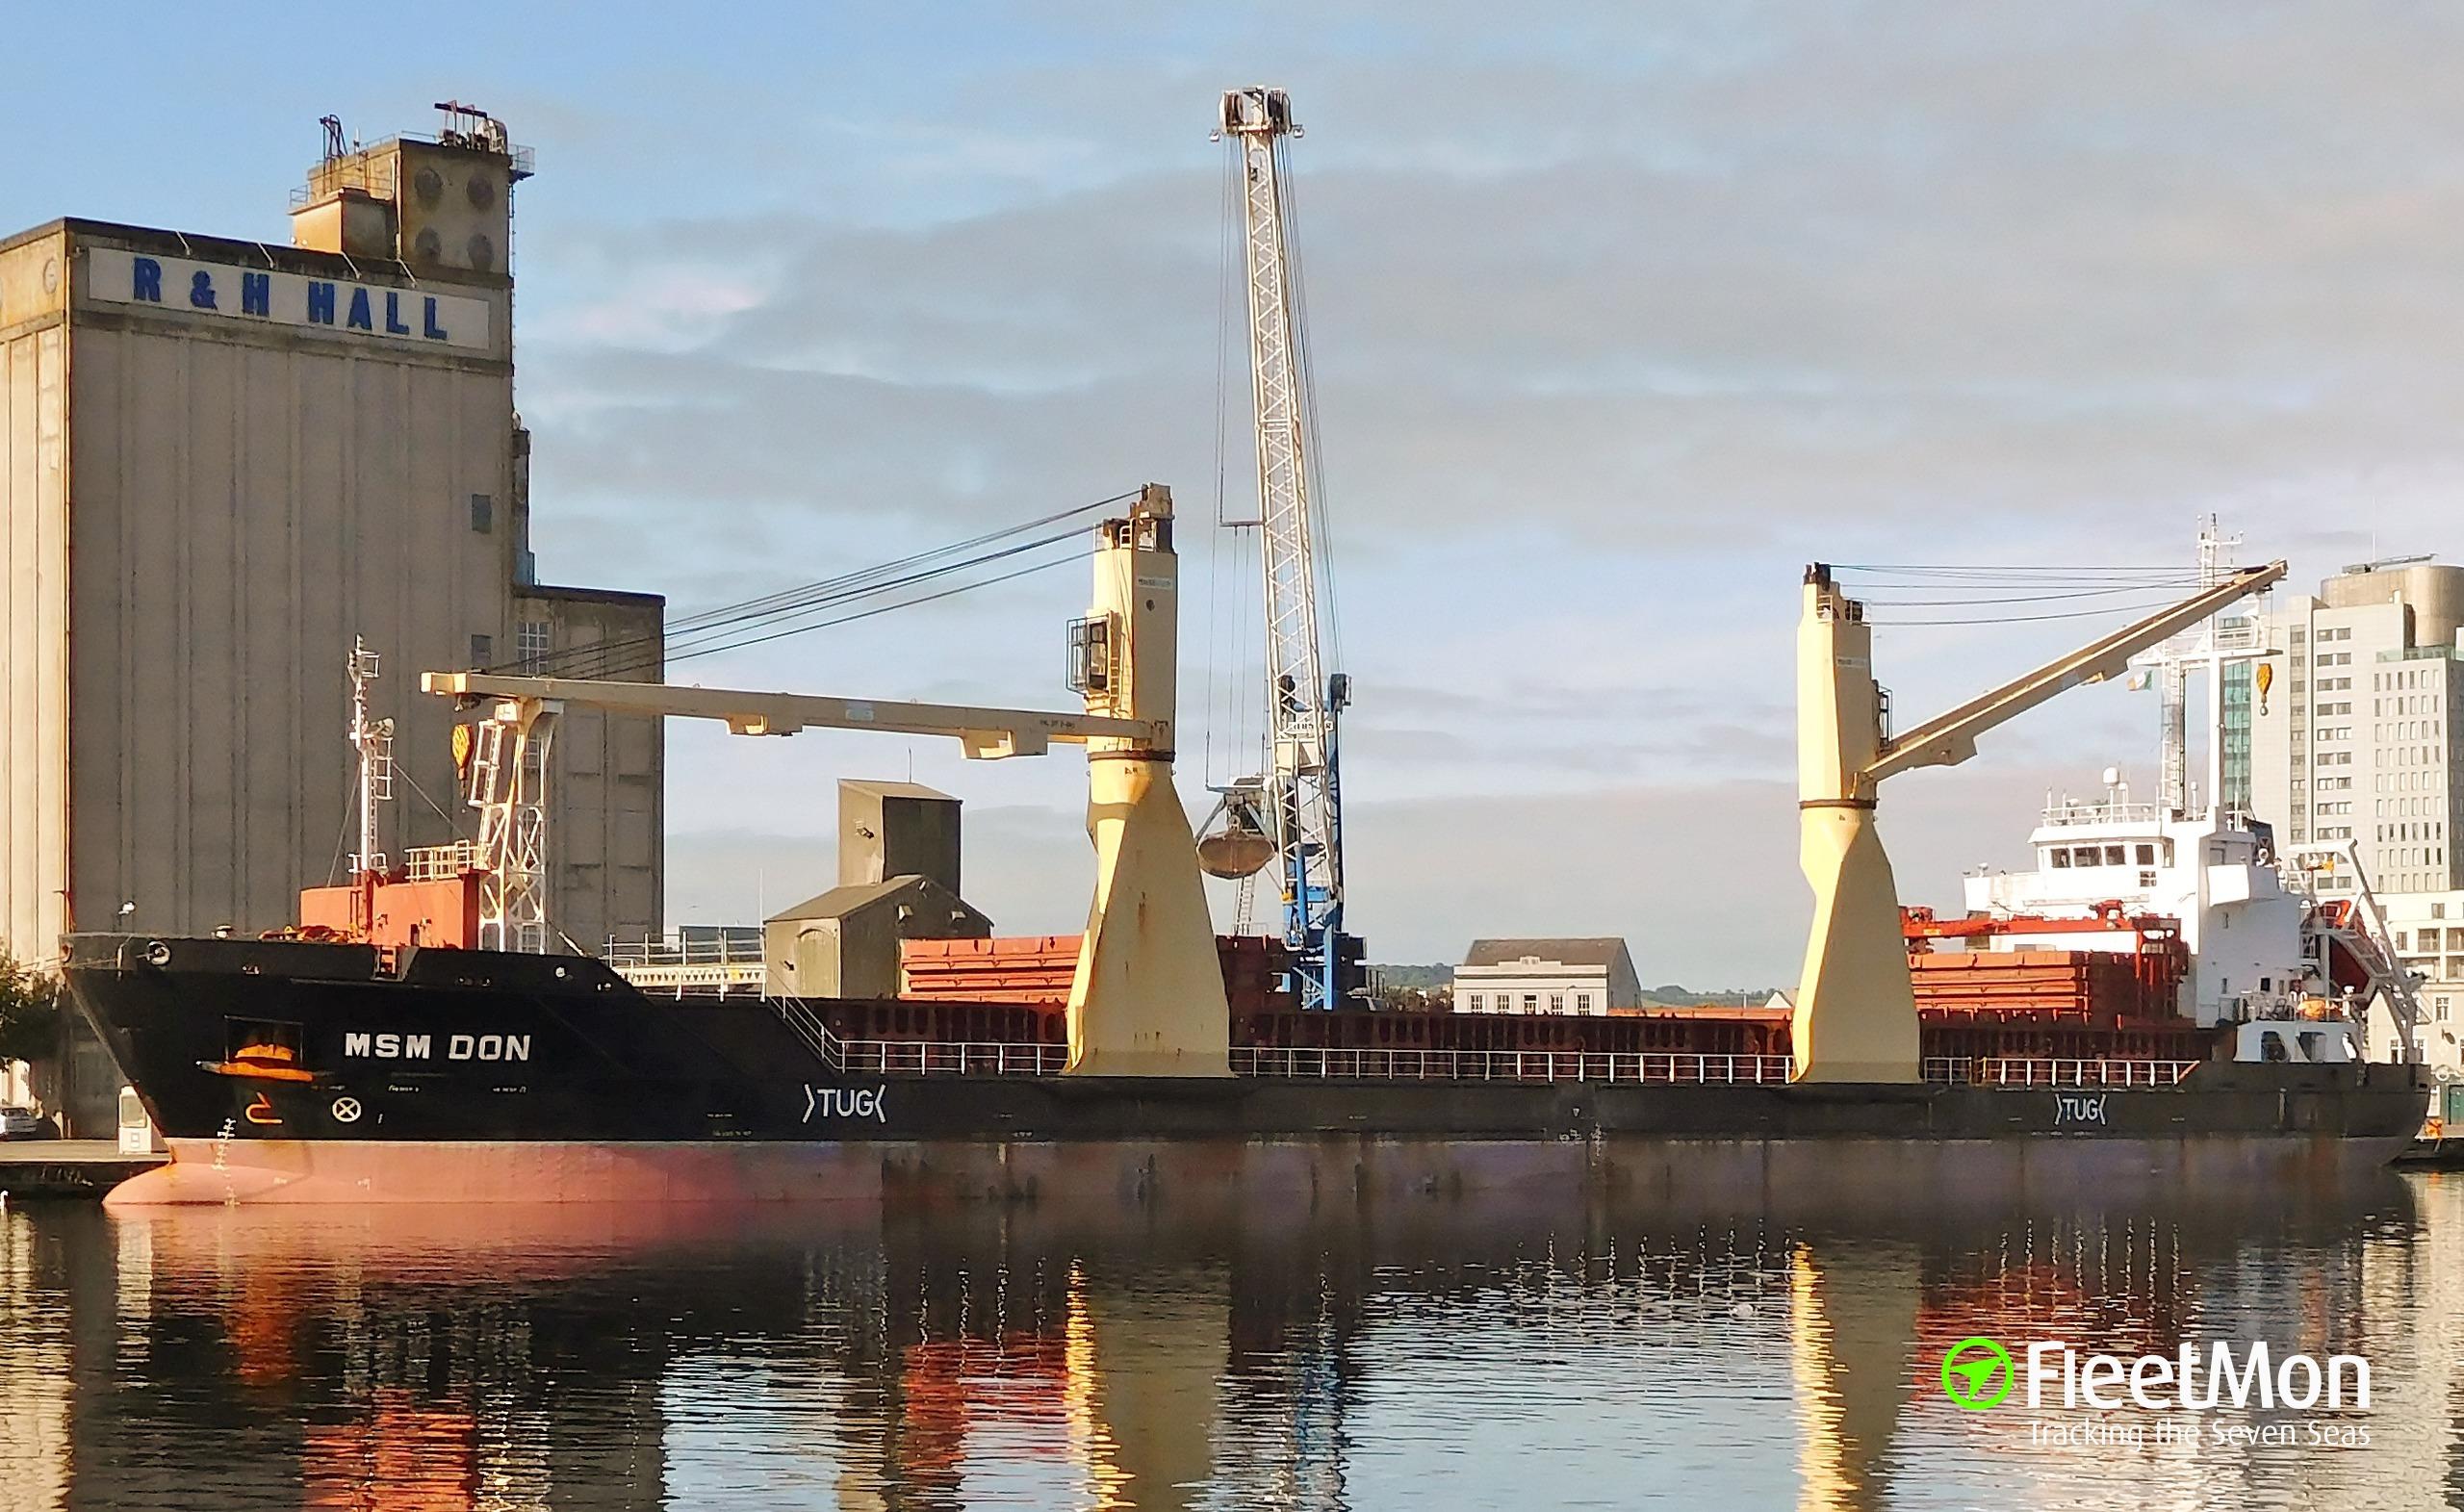 Msm cargo tracking - More Photos